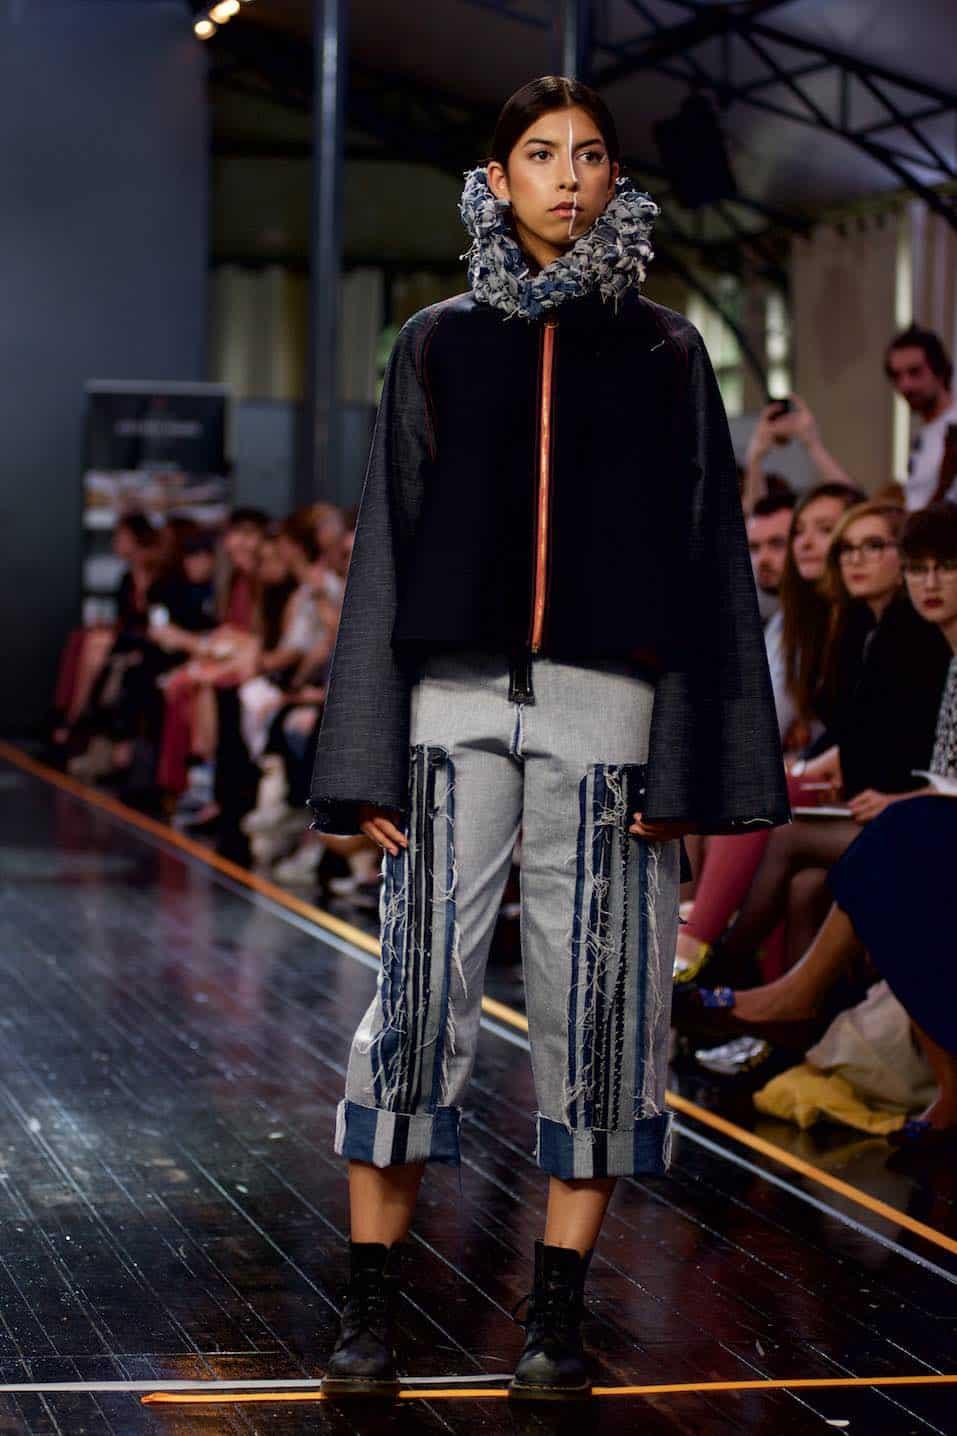 Défilé Studio Mode Paris